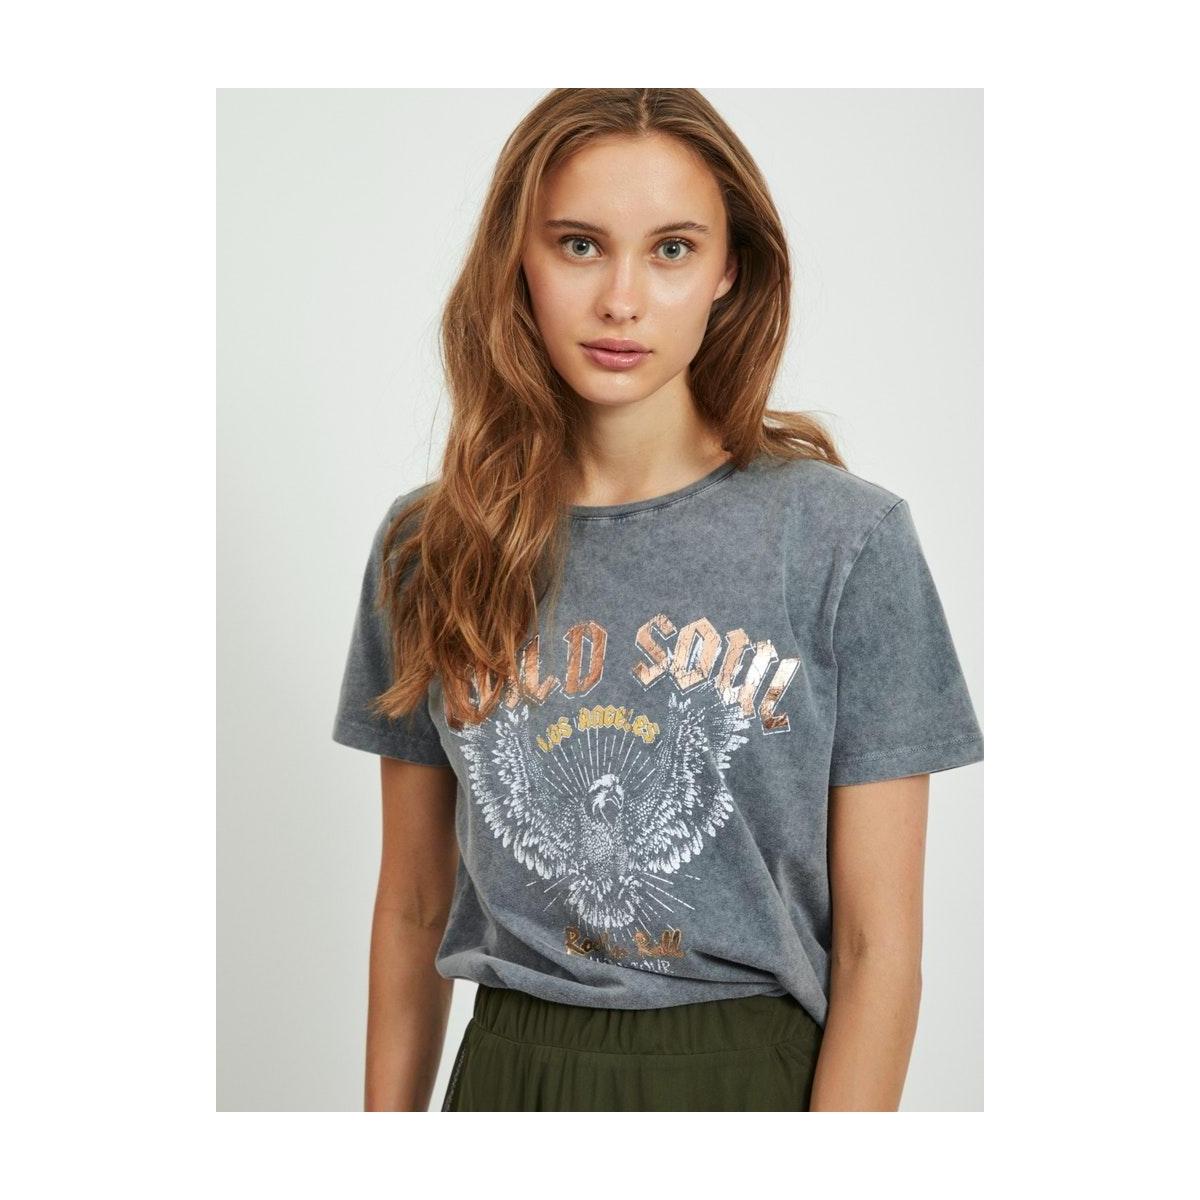 vidulla t-shirt 14061717 vila t-shirt black